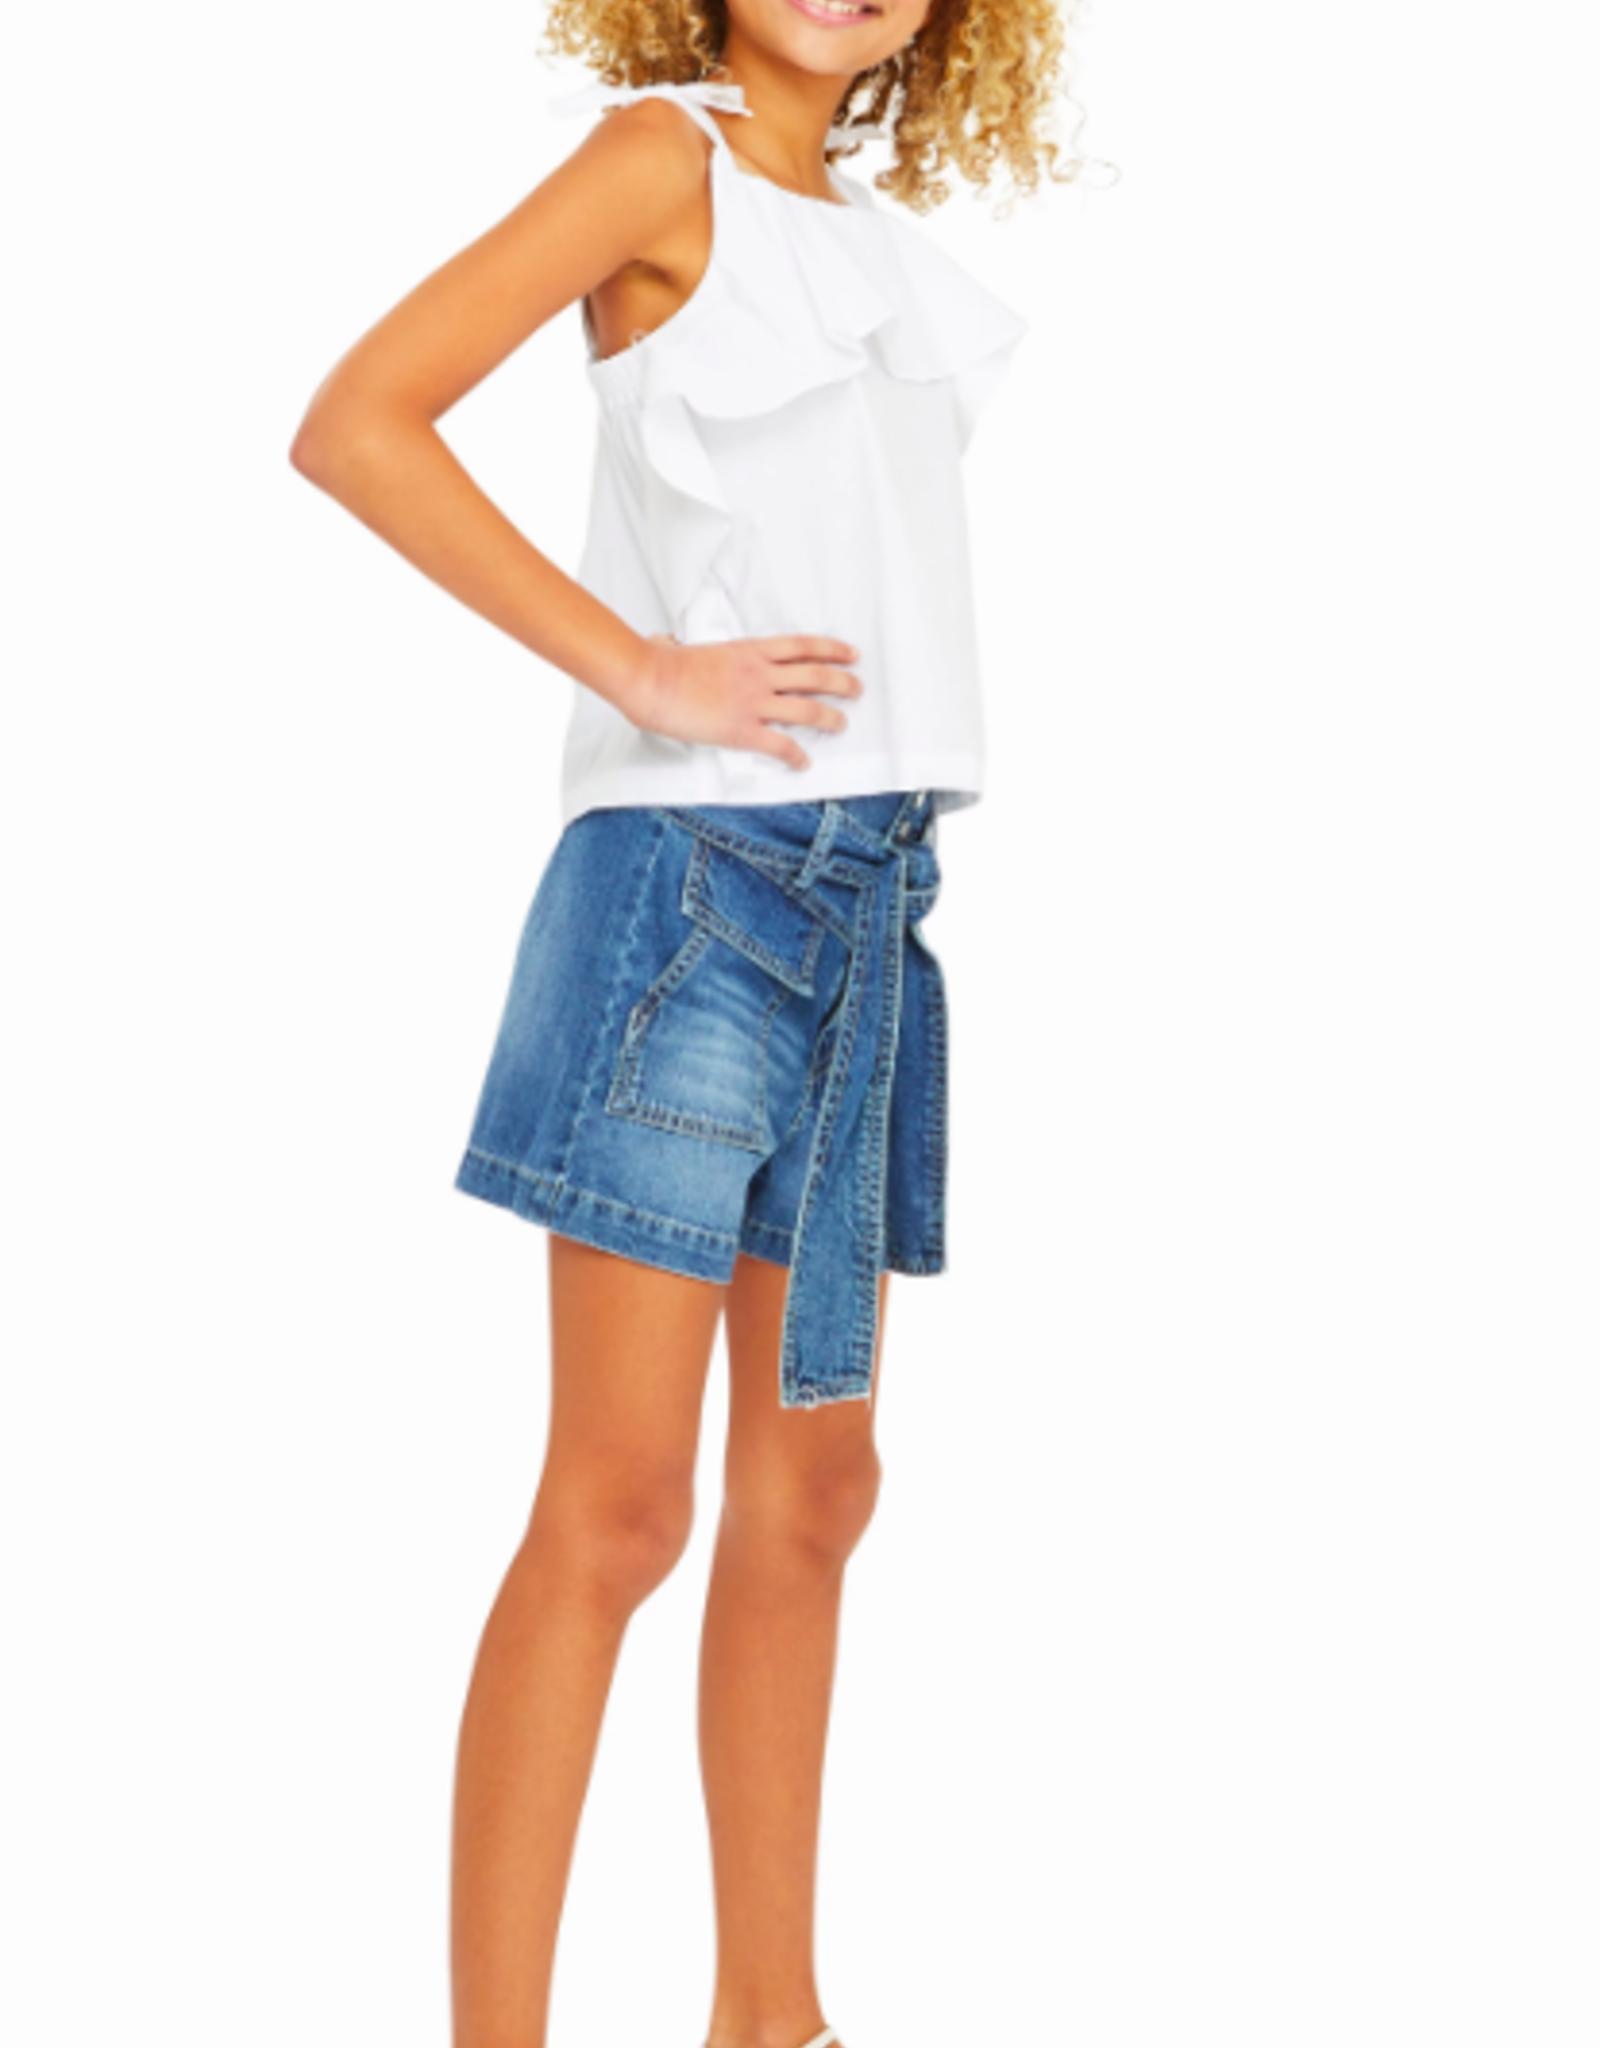 Habitual Girls Brisa Front Flounce Top